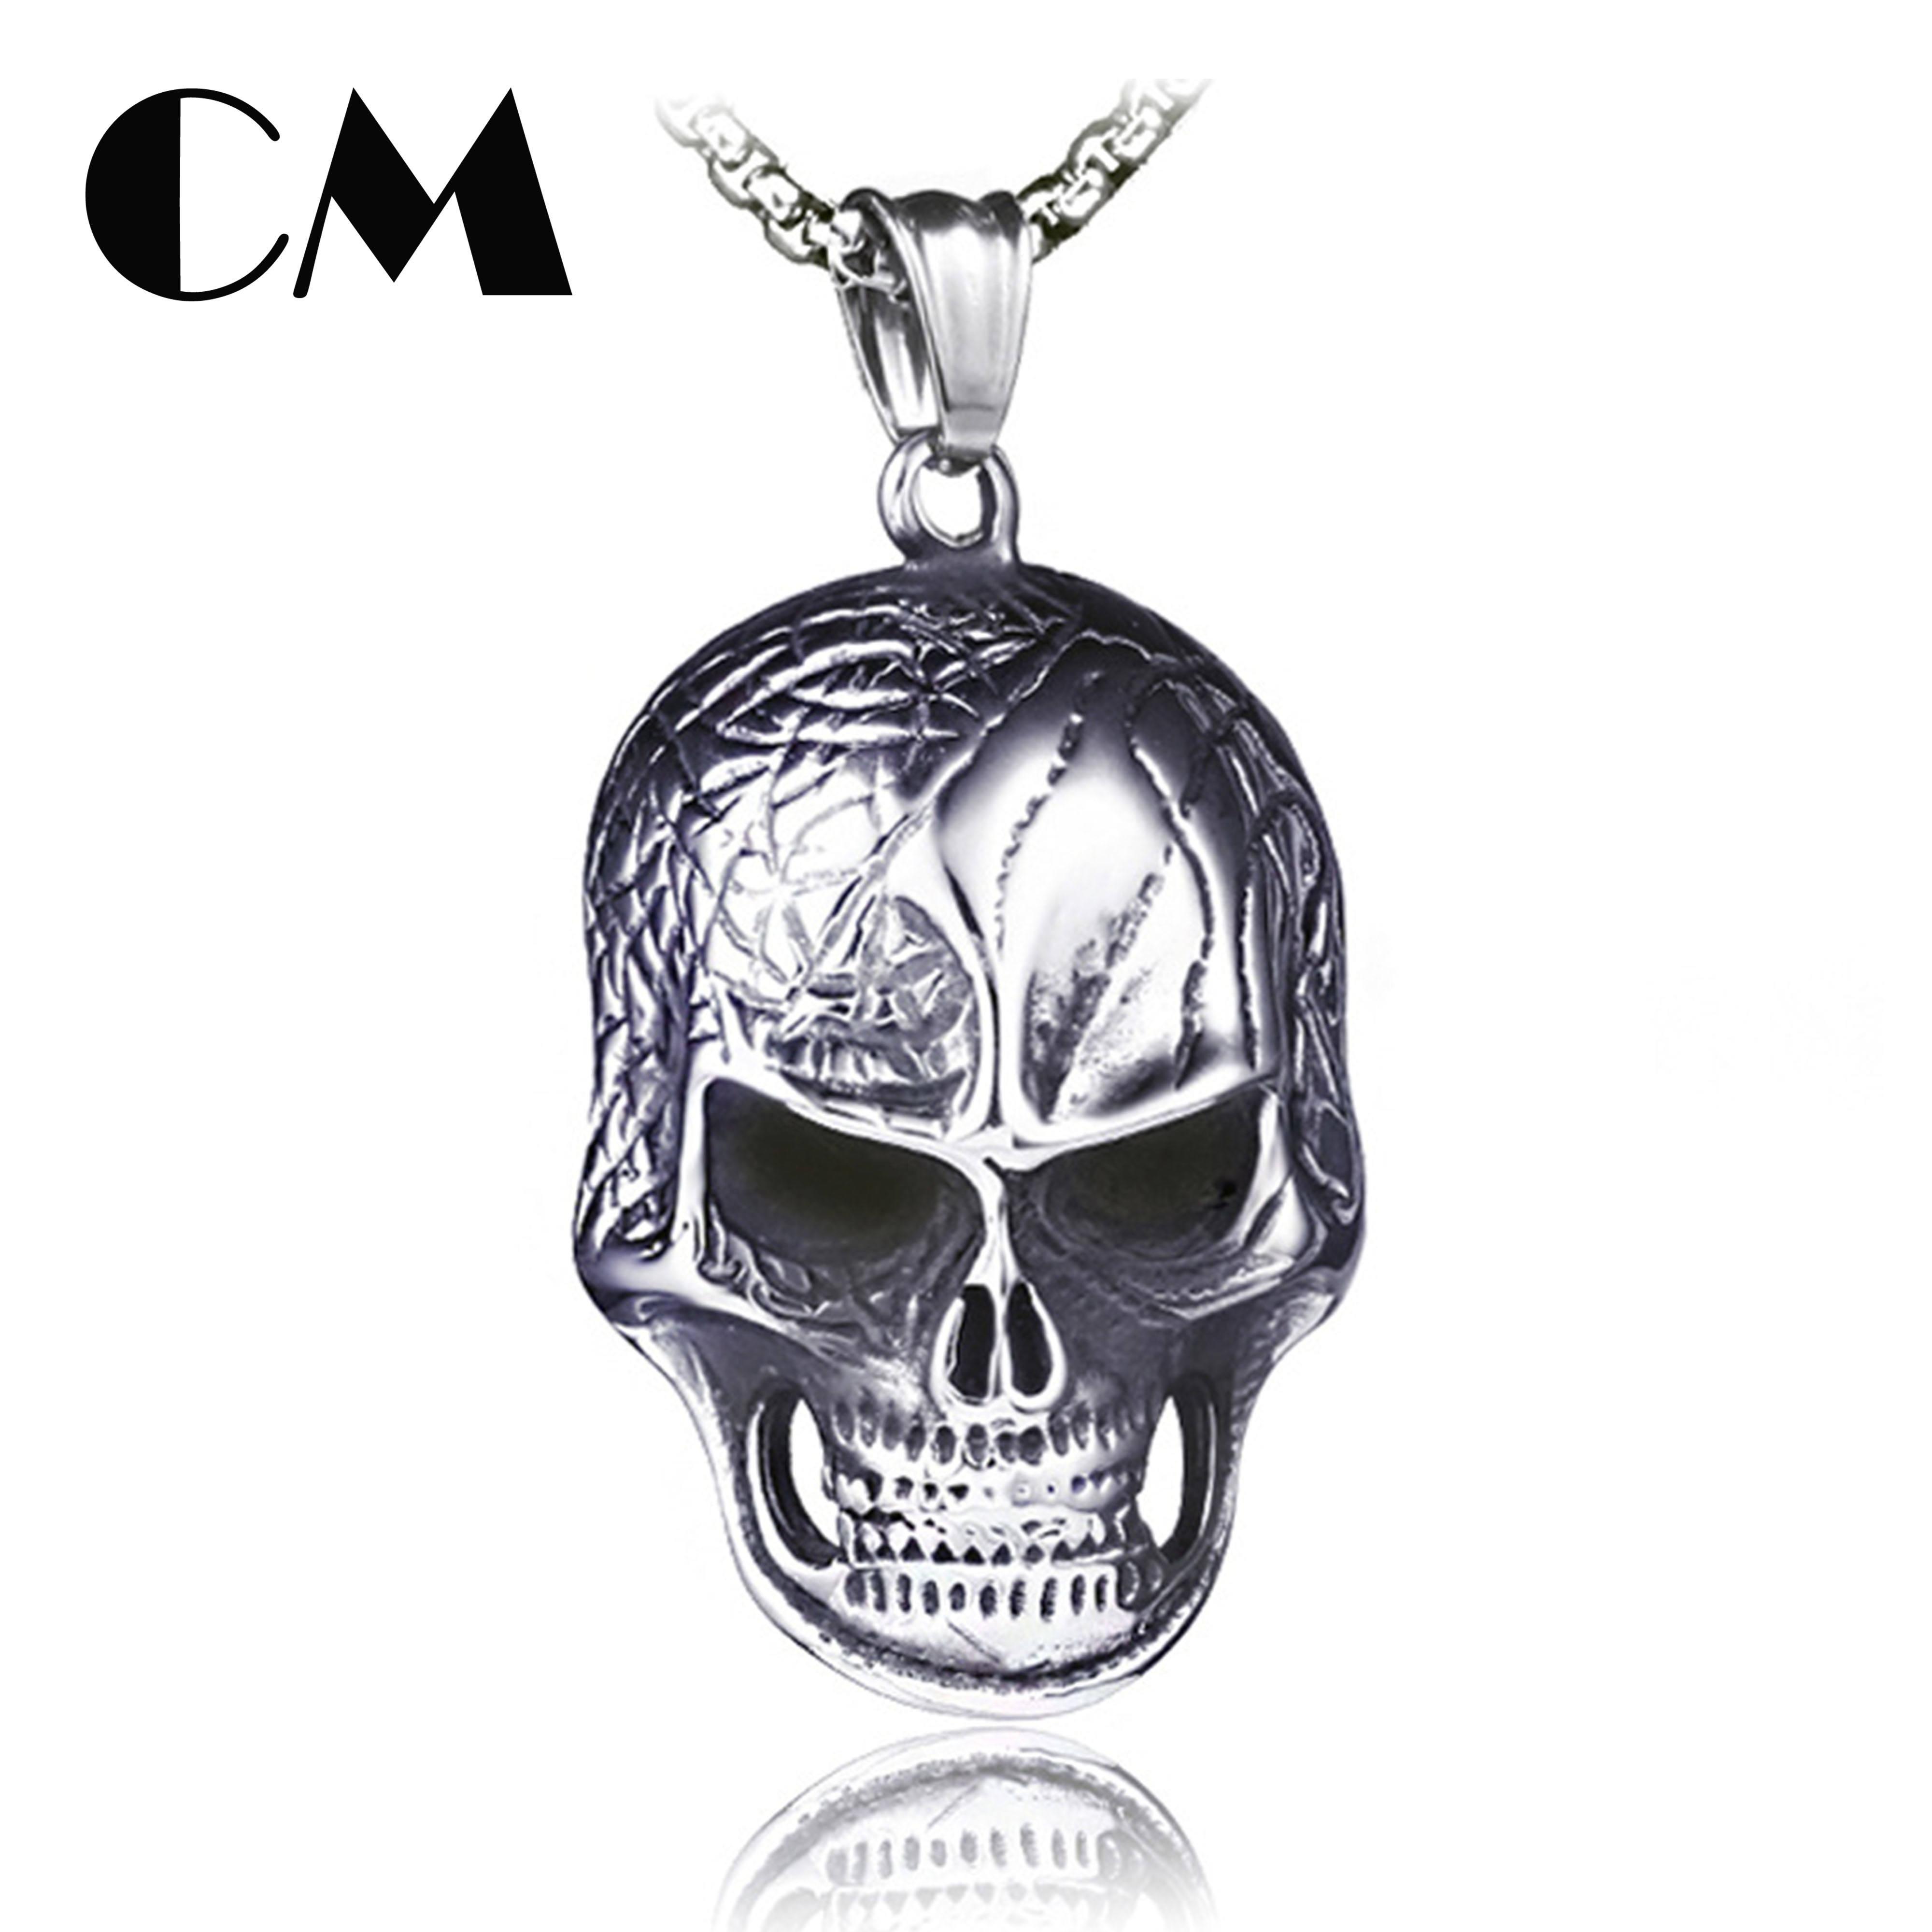 White Skull Pendant ruianshihongbenxiechang Skull Diamond Necklace Rock Hip Hop Style Alternative Personality Necklace